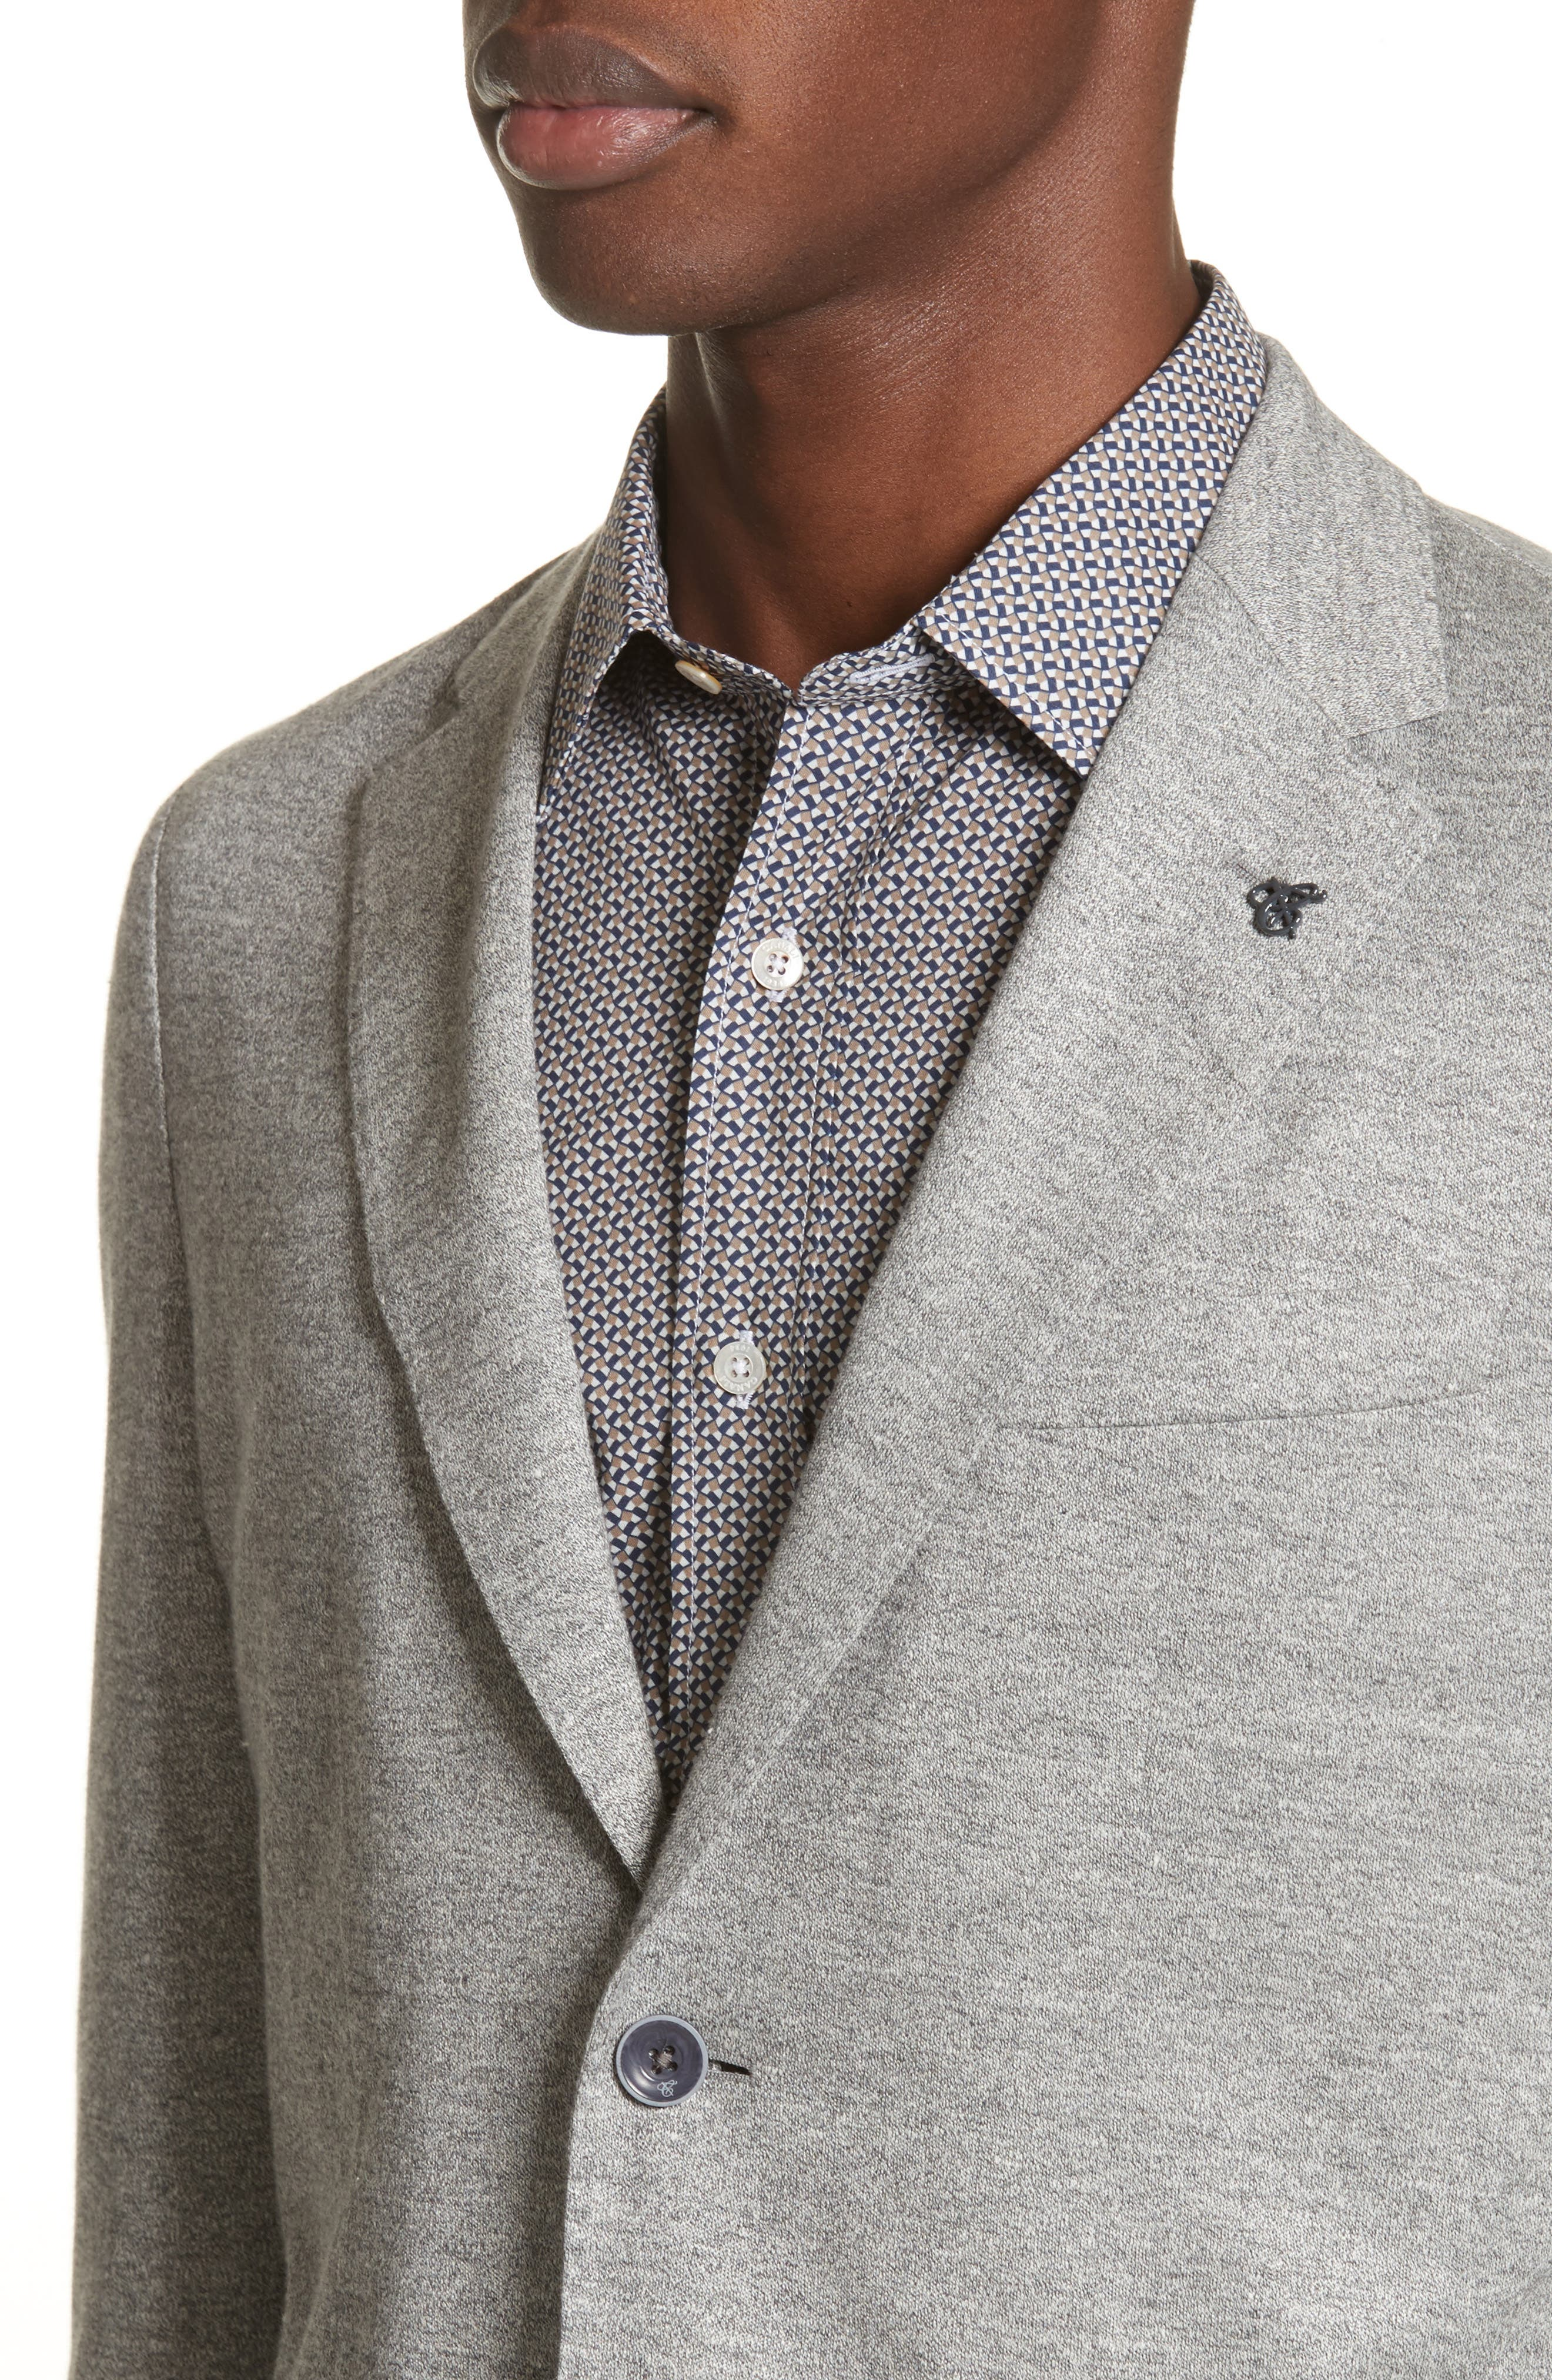 Trim Fit Washed Jersey Jacket,                             Alternate thumbnail 4, color,                             050